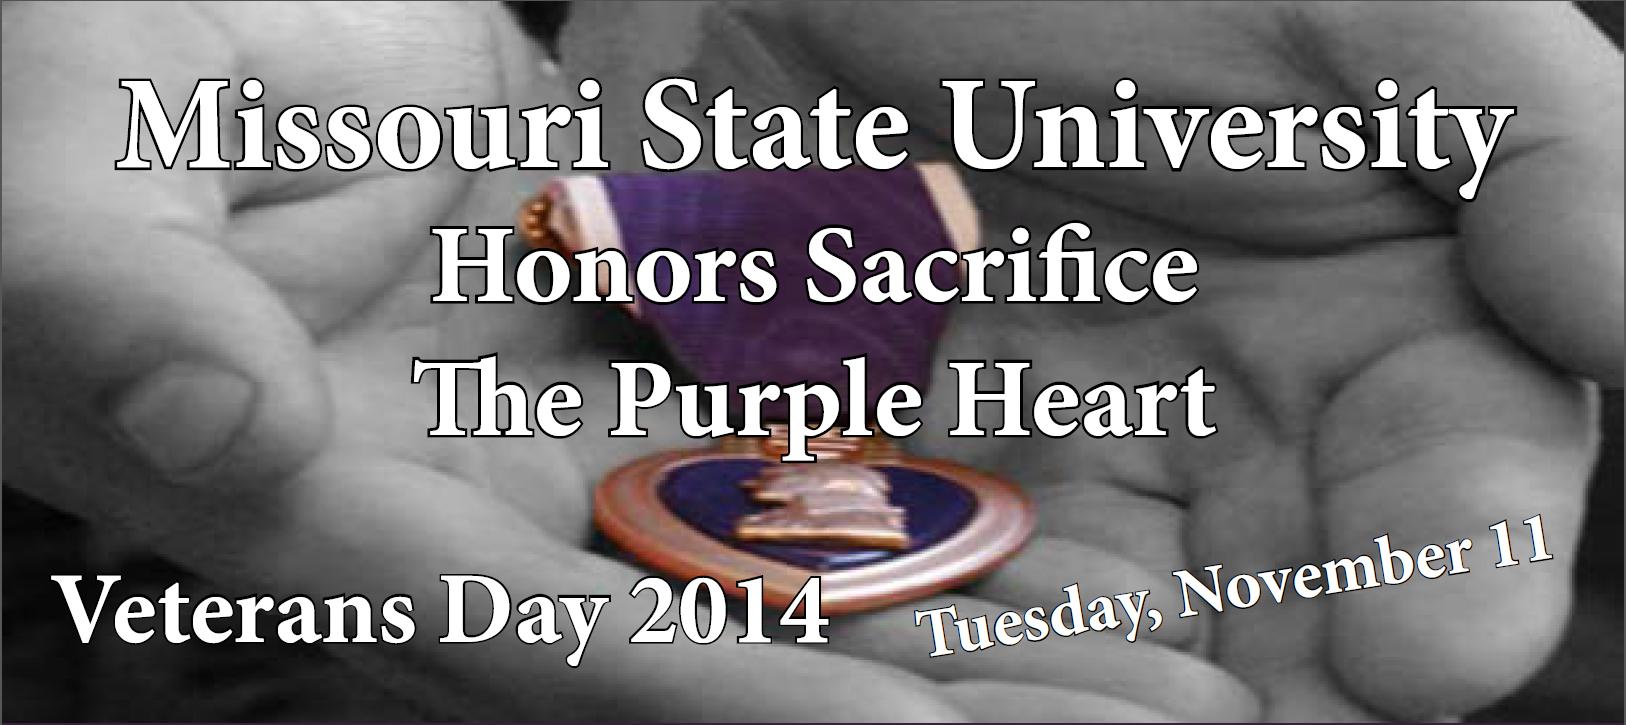 MSU Honors Sacrifice The Purple Heart